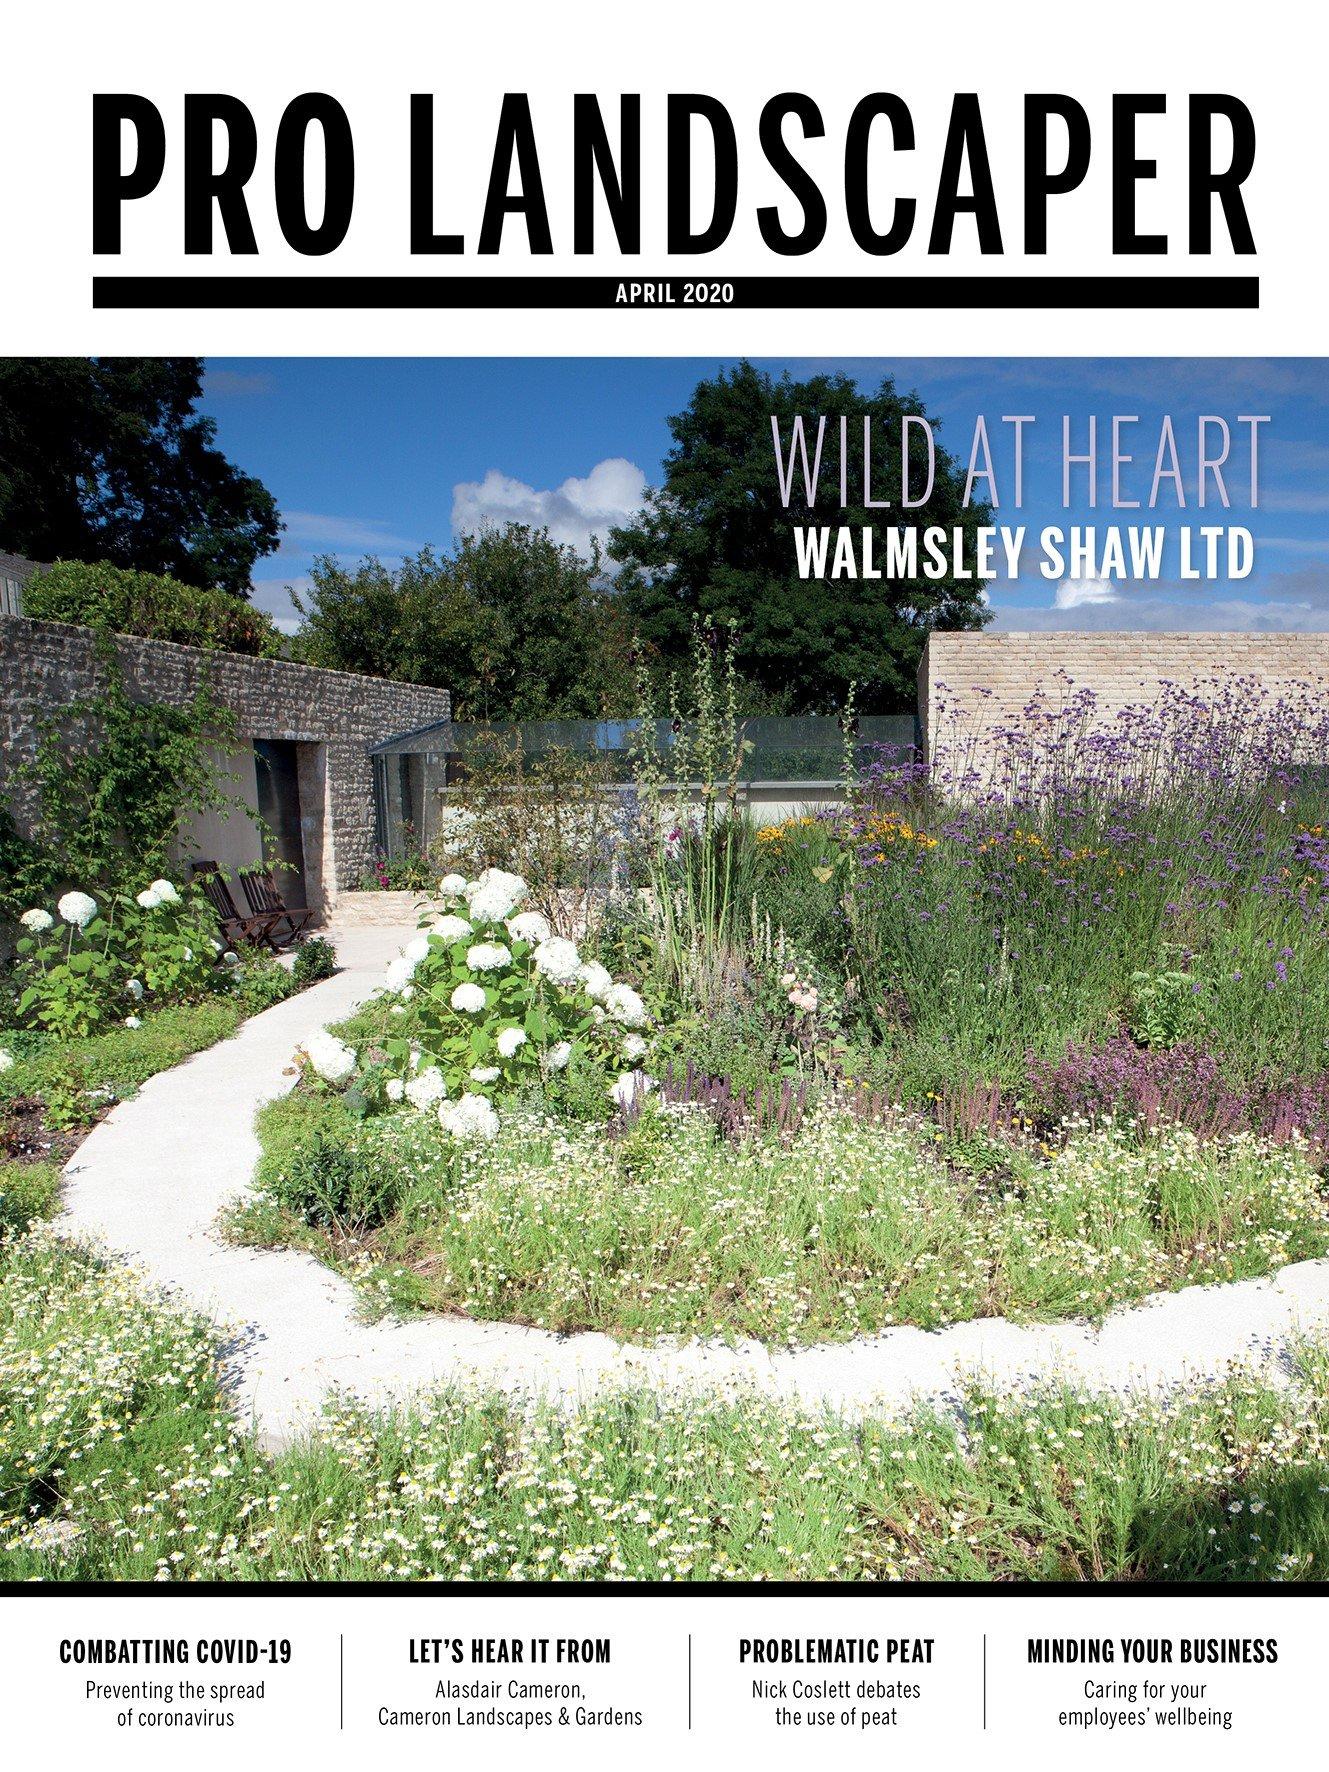 Pro Landscaper APRIL